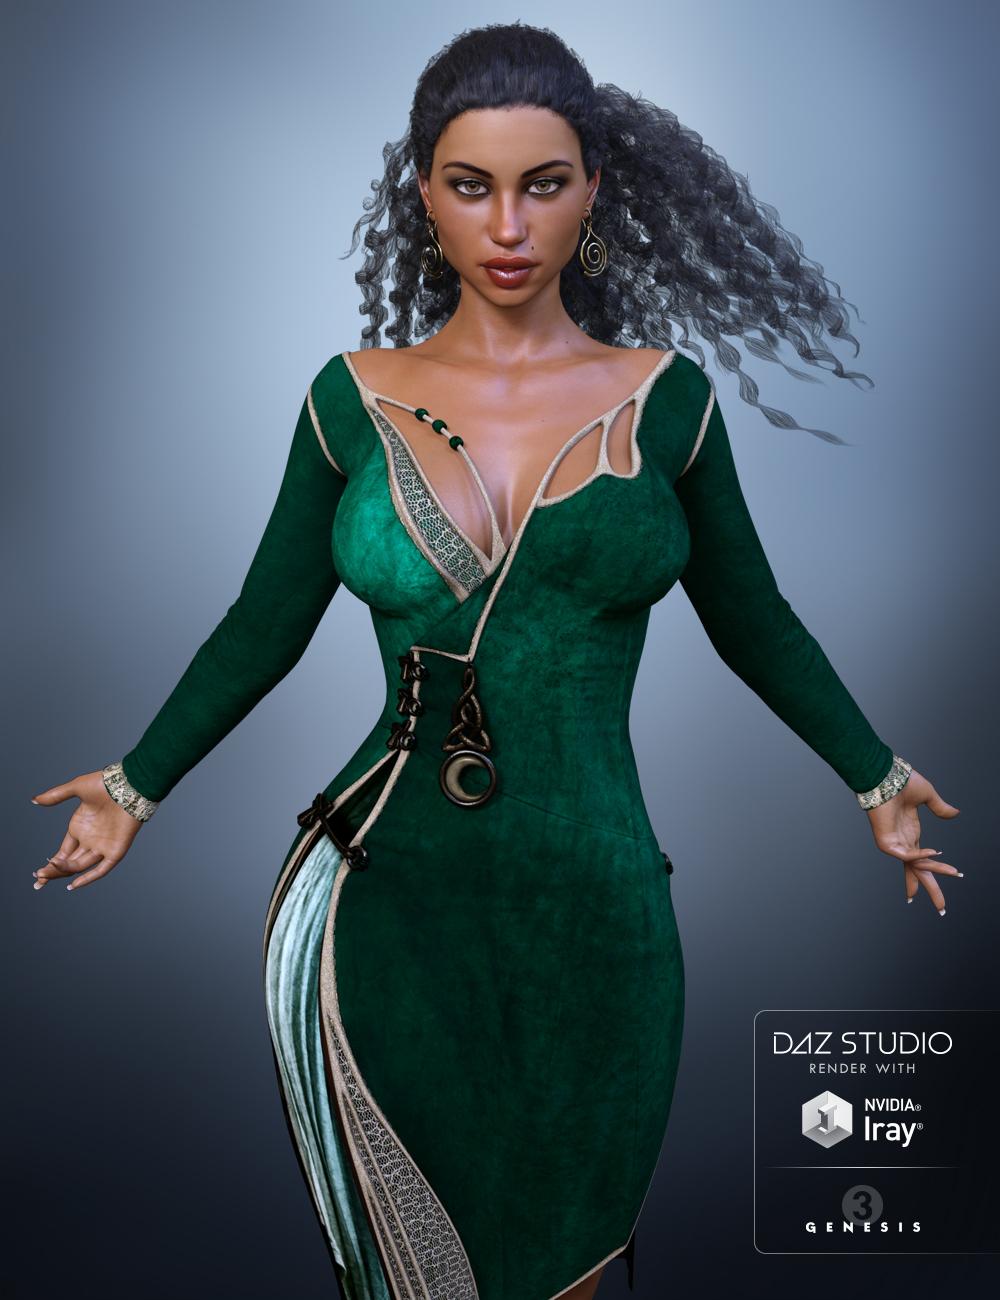 FWSA Shiloh HD for Lilith 7 by: Fred Winkler ArtSabby, 3D Models by Daz 3D